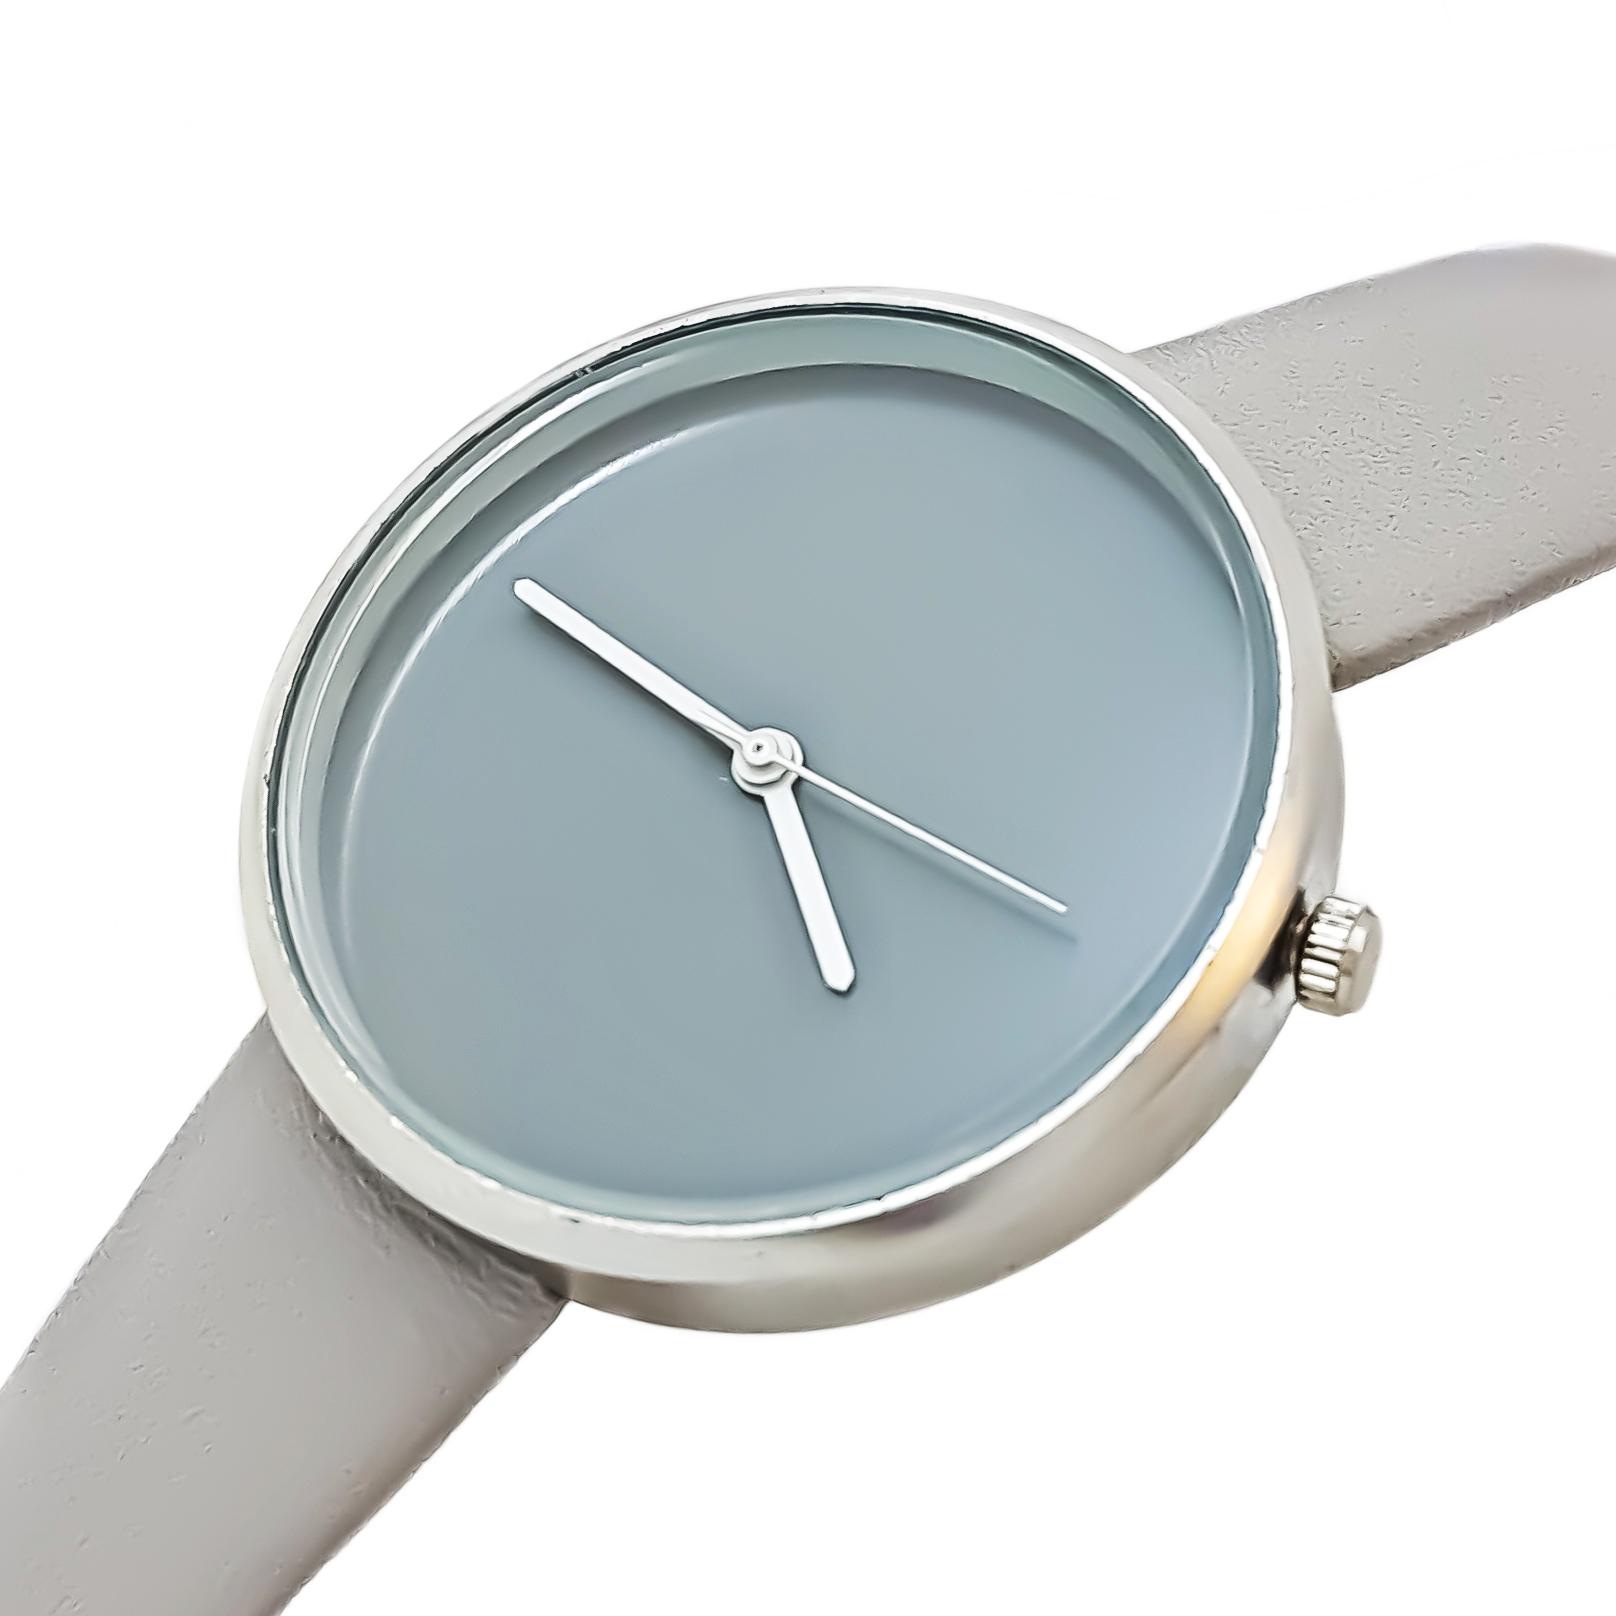 ساعت مچی  زنانه کد VS5435              اصل